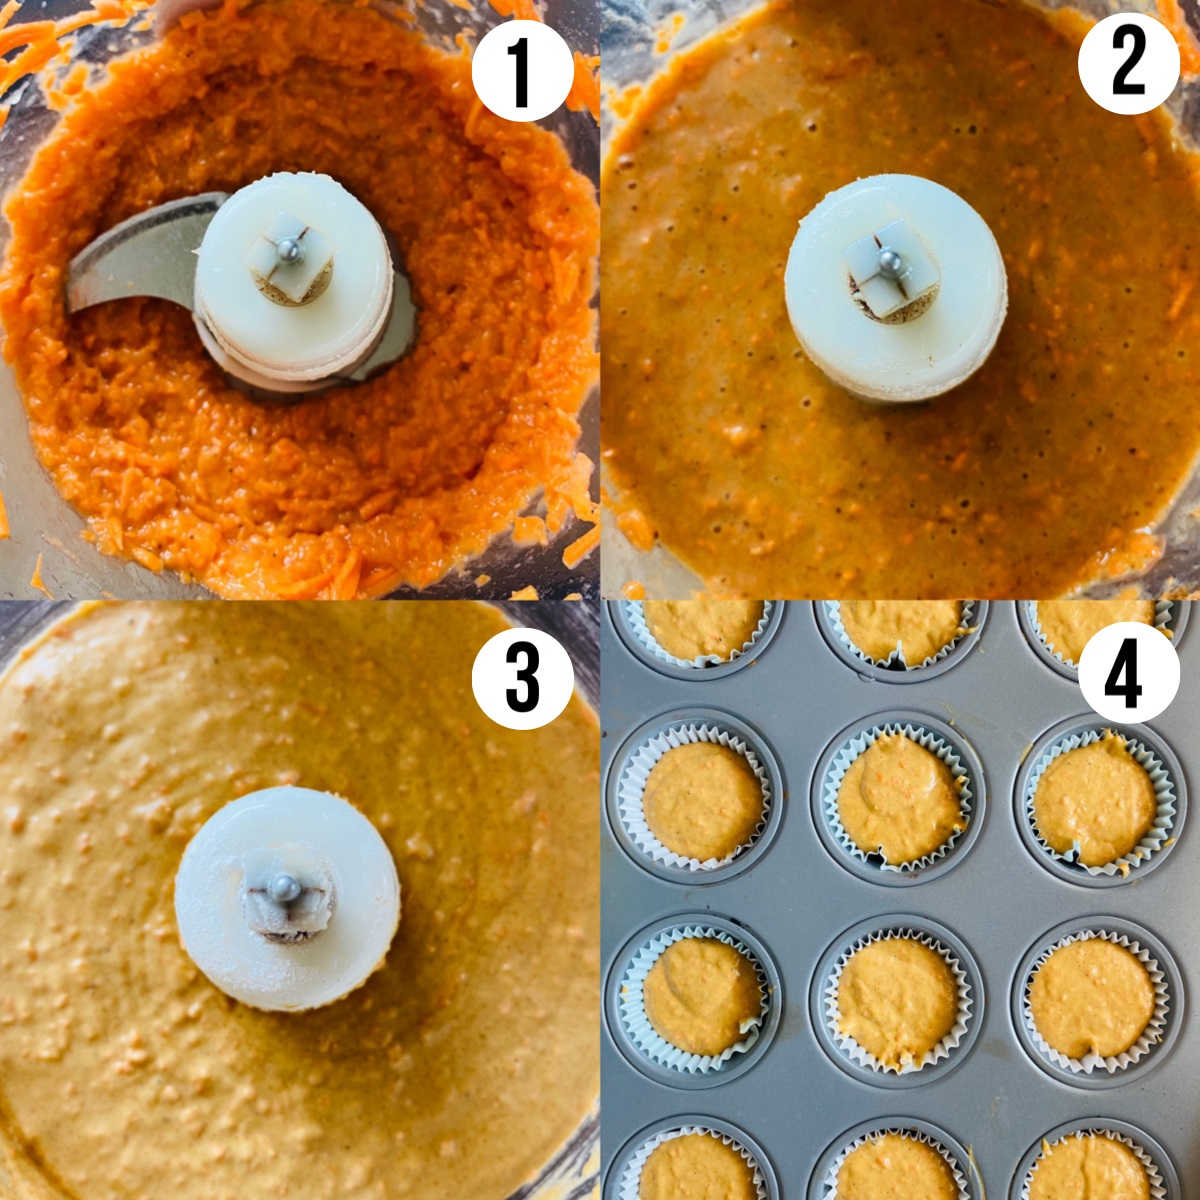 banana carrot muffins process shots 1-4